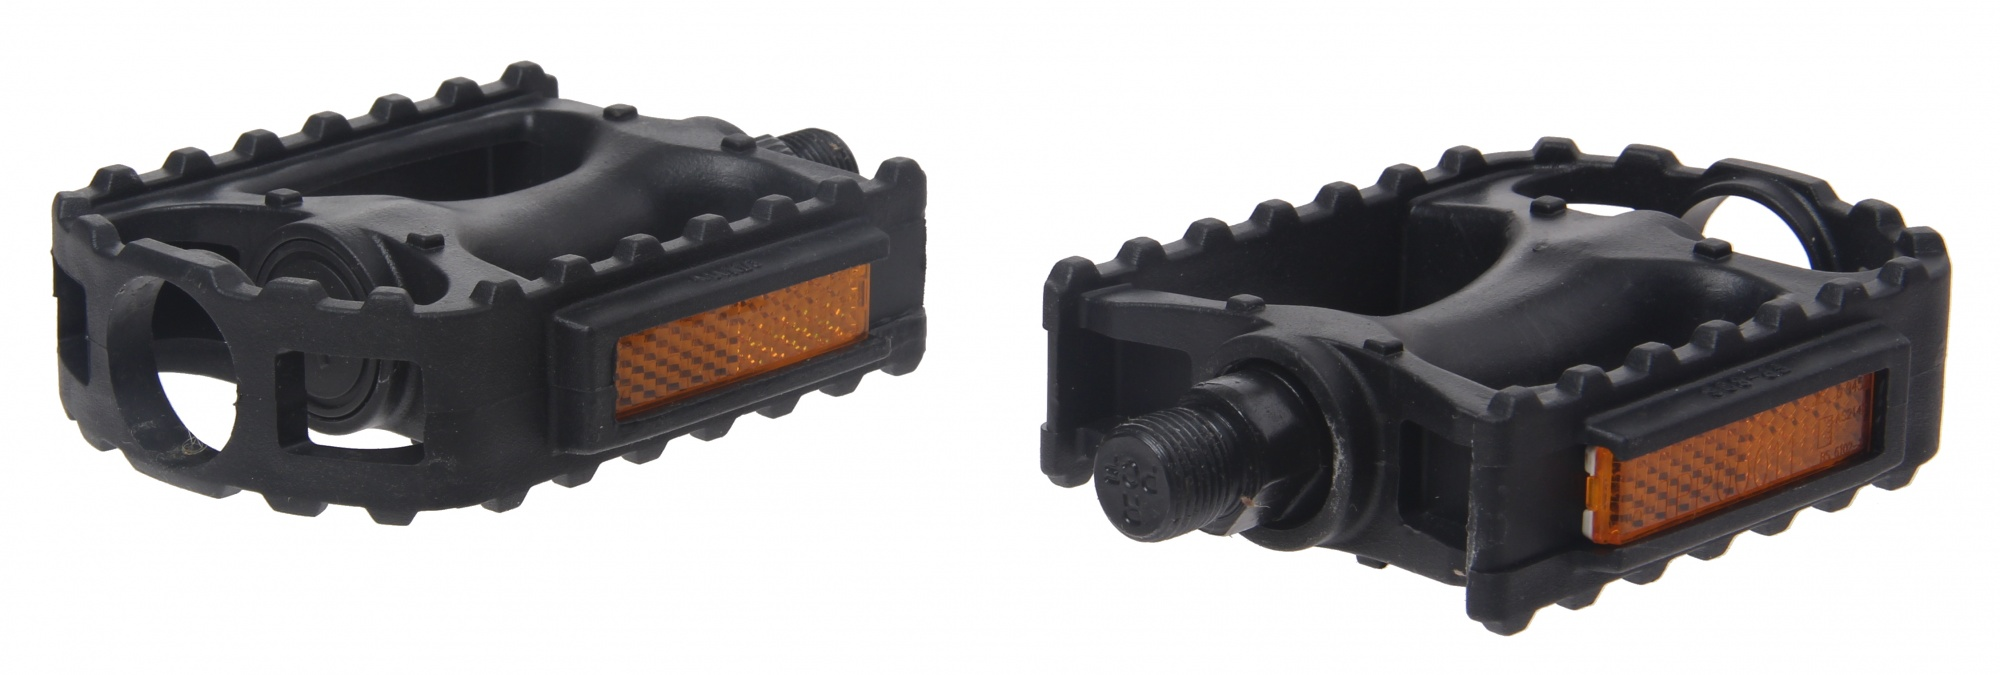 Bicycle Gear Platform Pedal Fp 806 9 16 Inch Black Per Set